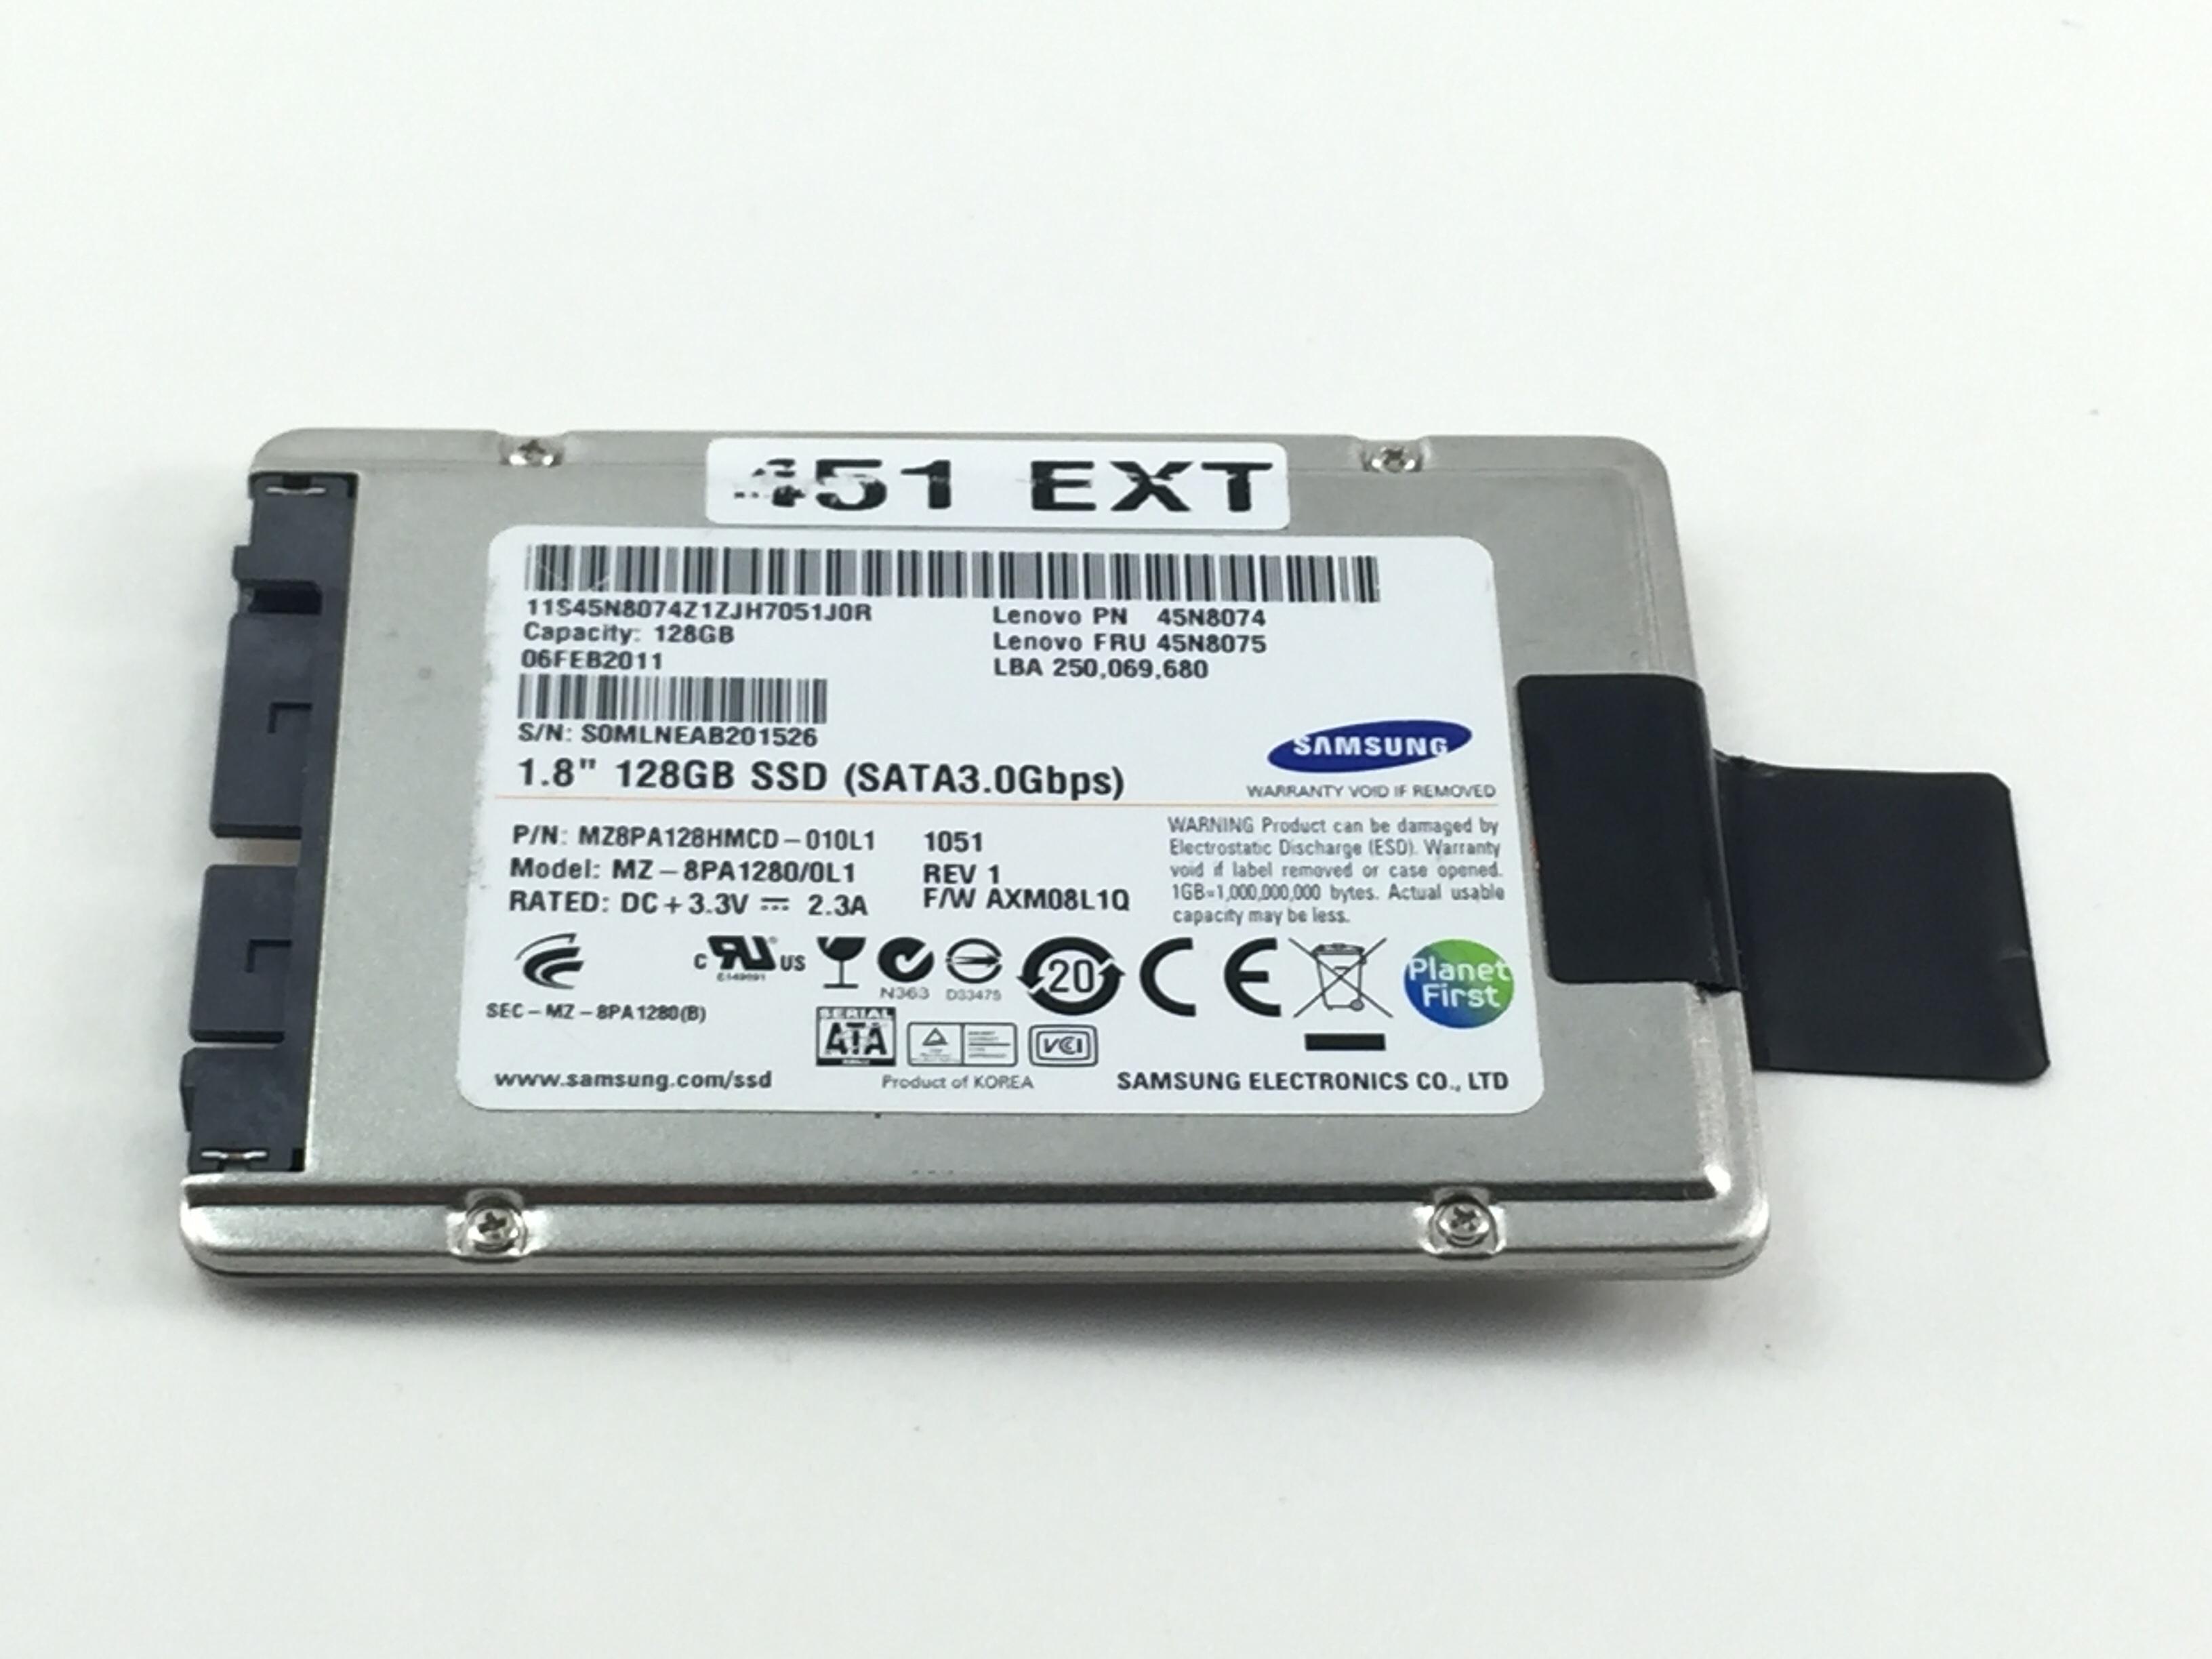 Lenovo Samsung 128GB 3Gbps SATA 1.8'' Solid State Hard Drive. (45N8074)